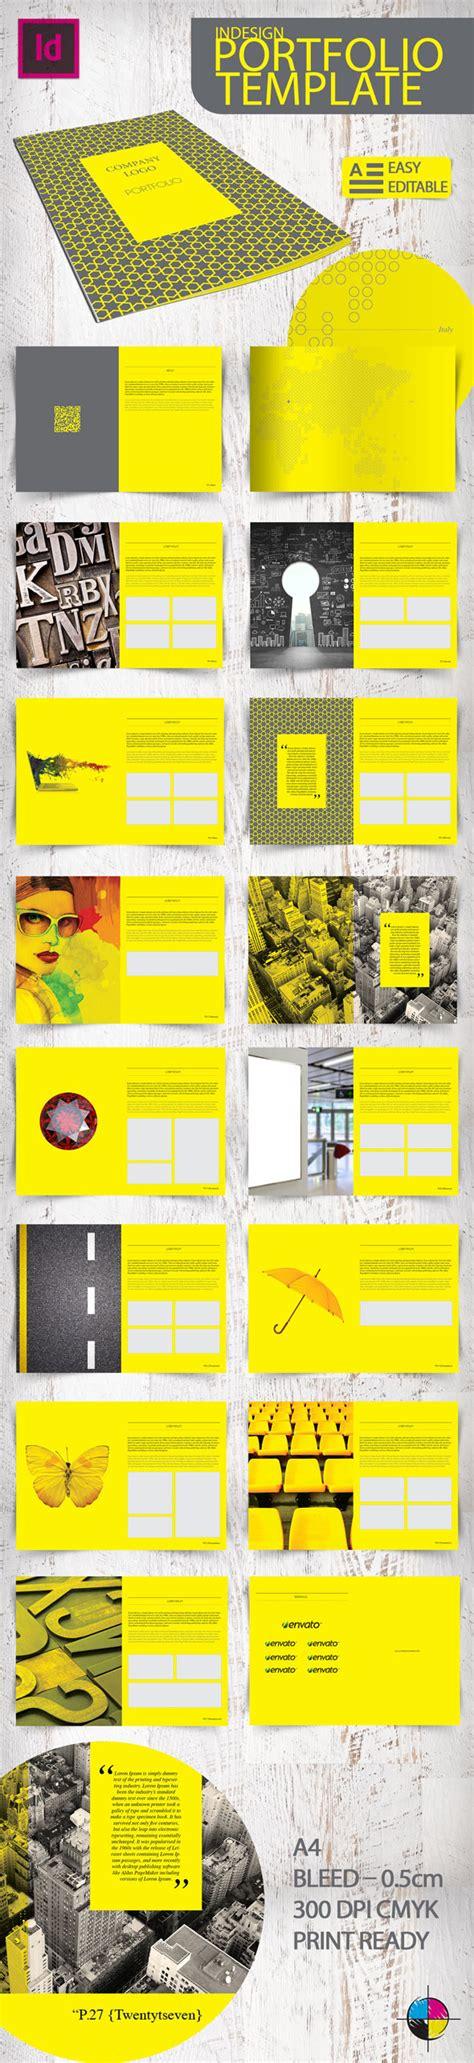 indesign portfolio template indesign portfolio template on behance